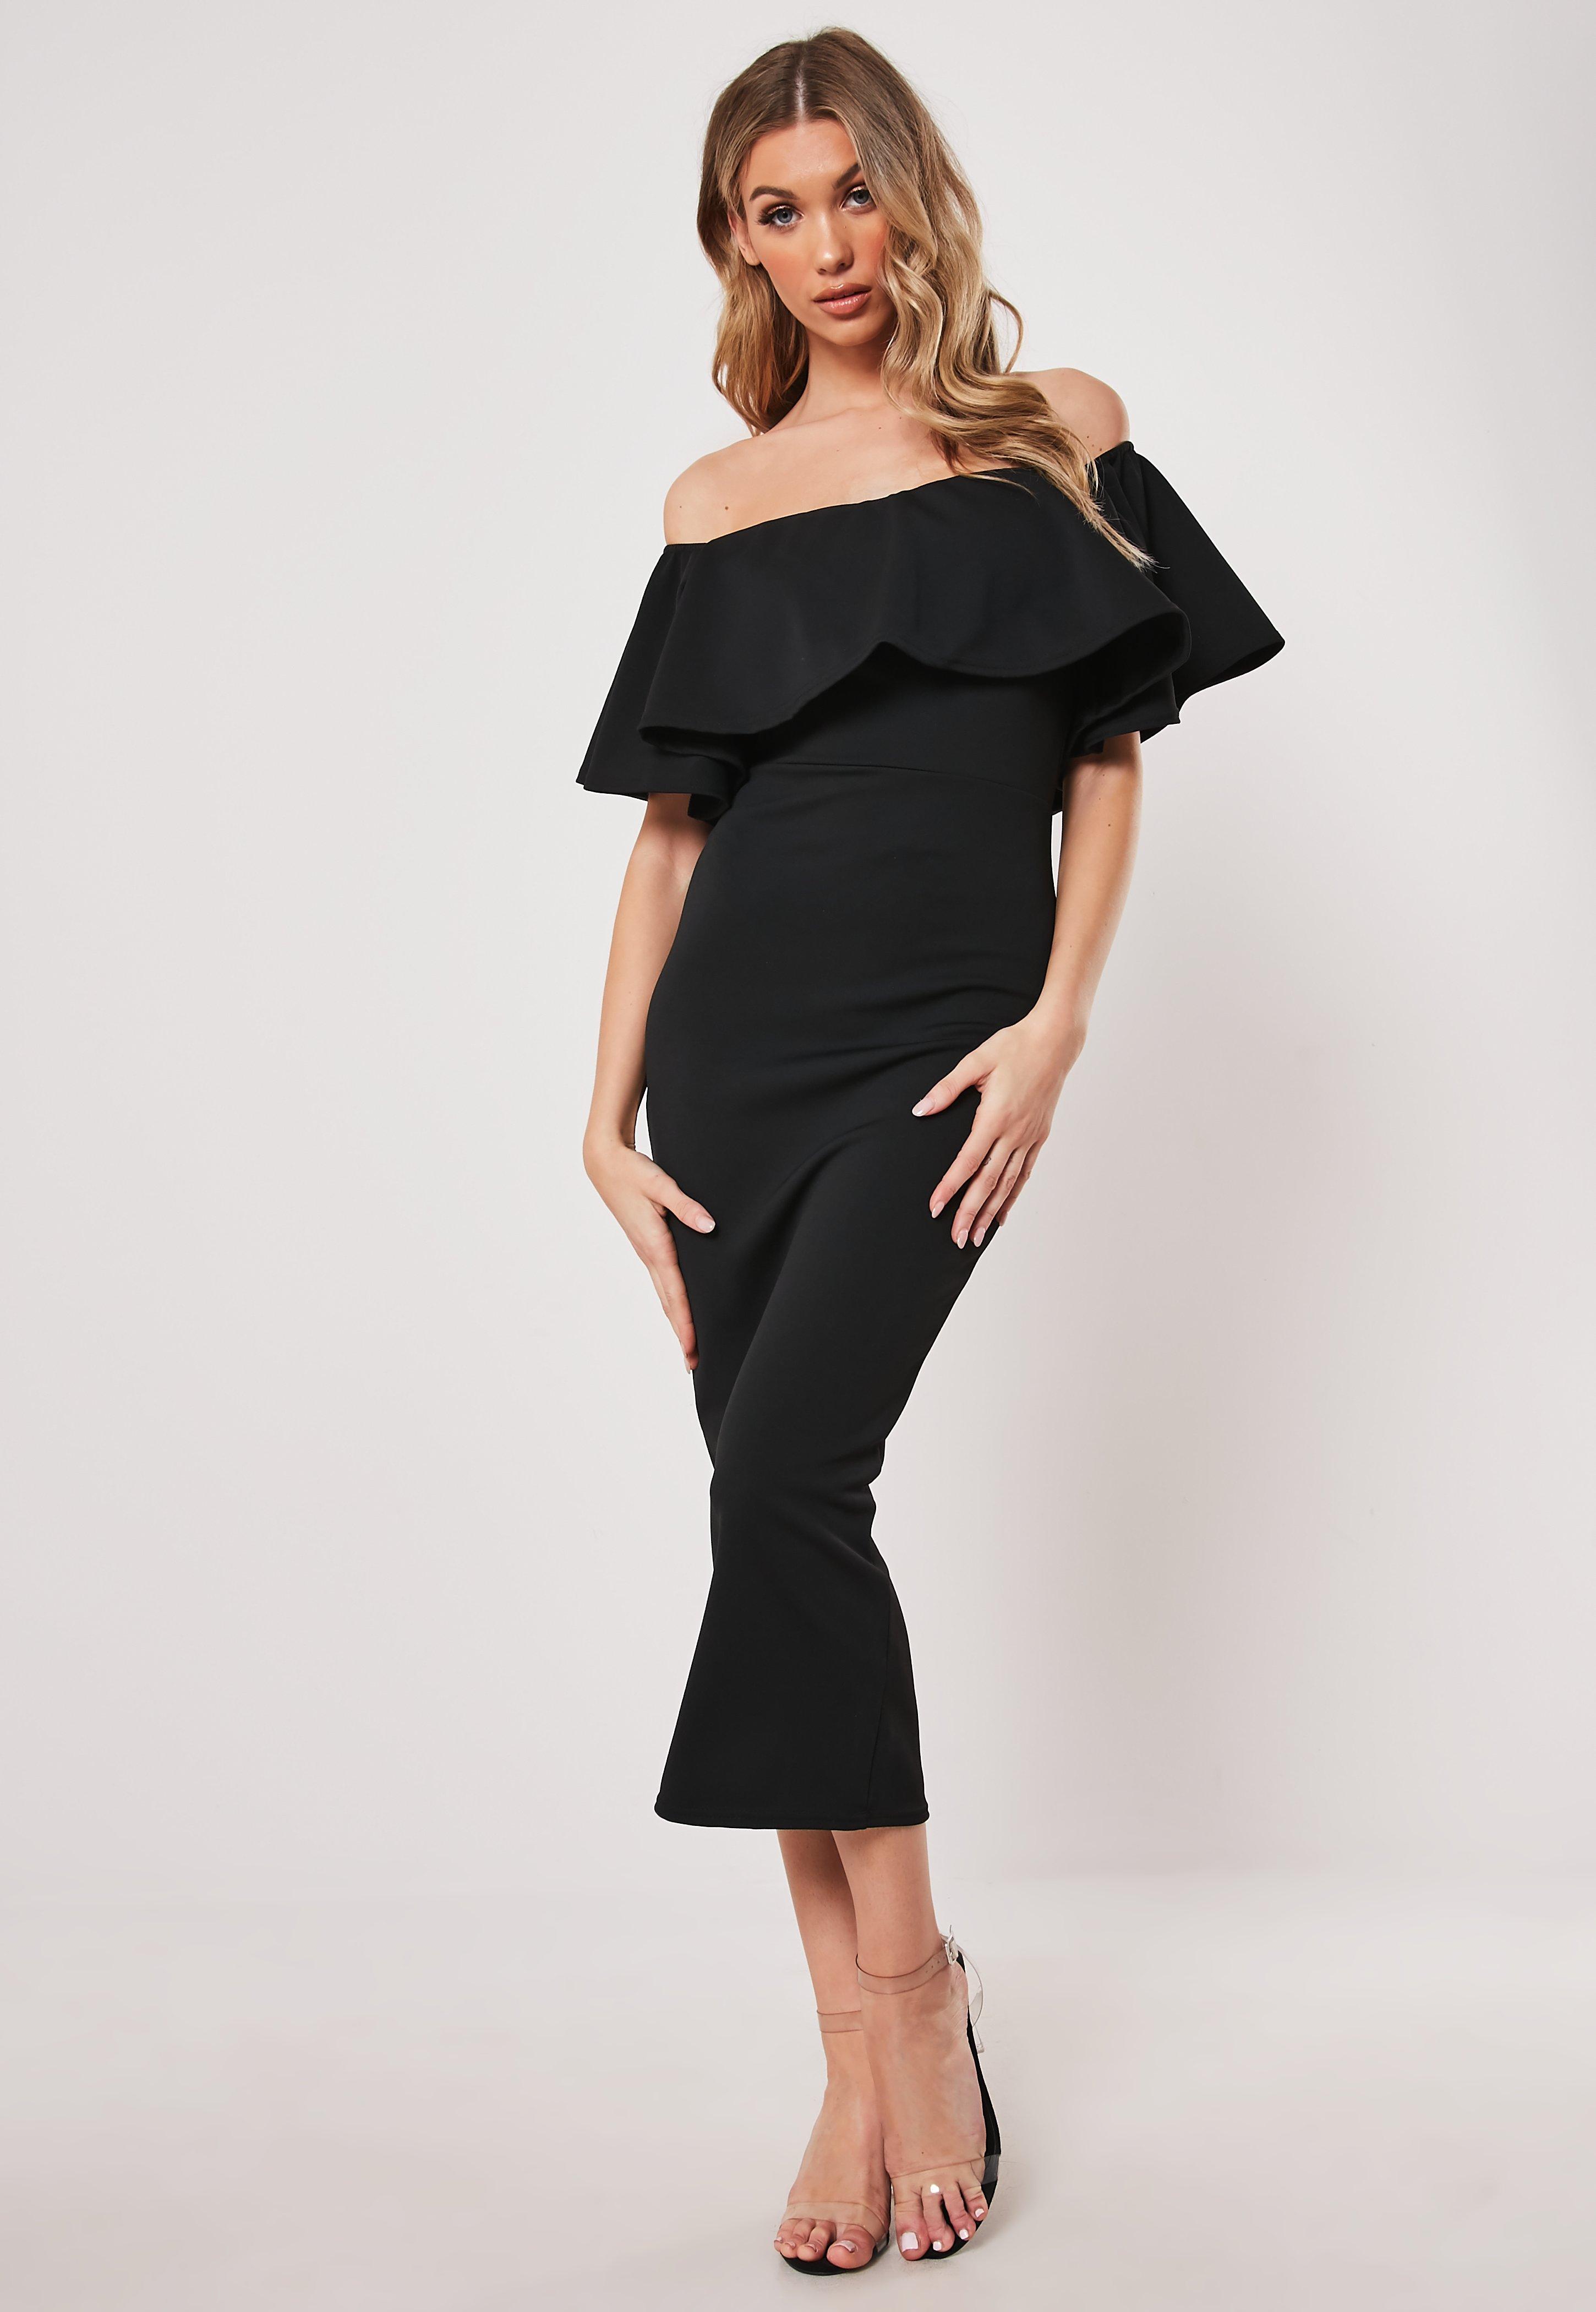 82ec89bf3e823 Black Bardot Frill Bodycon Midi Dress | Missguided Australia